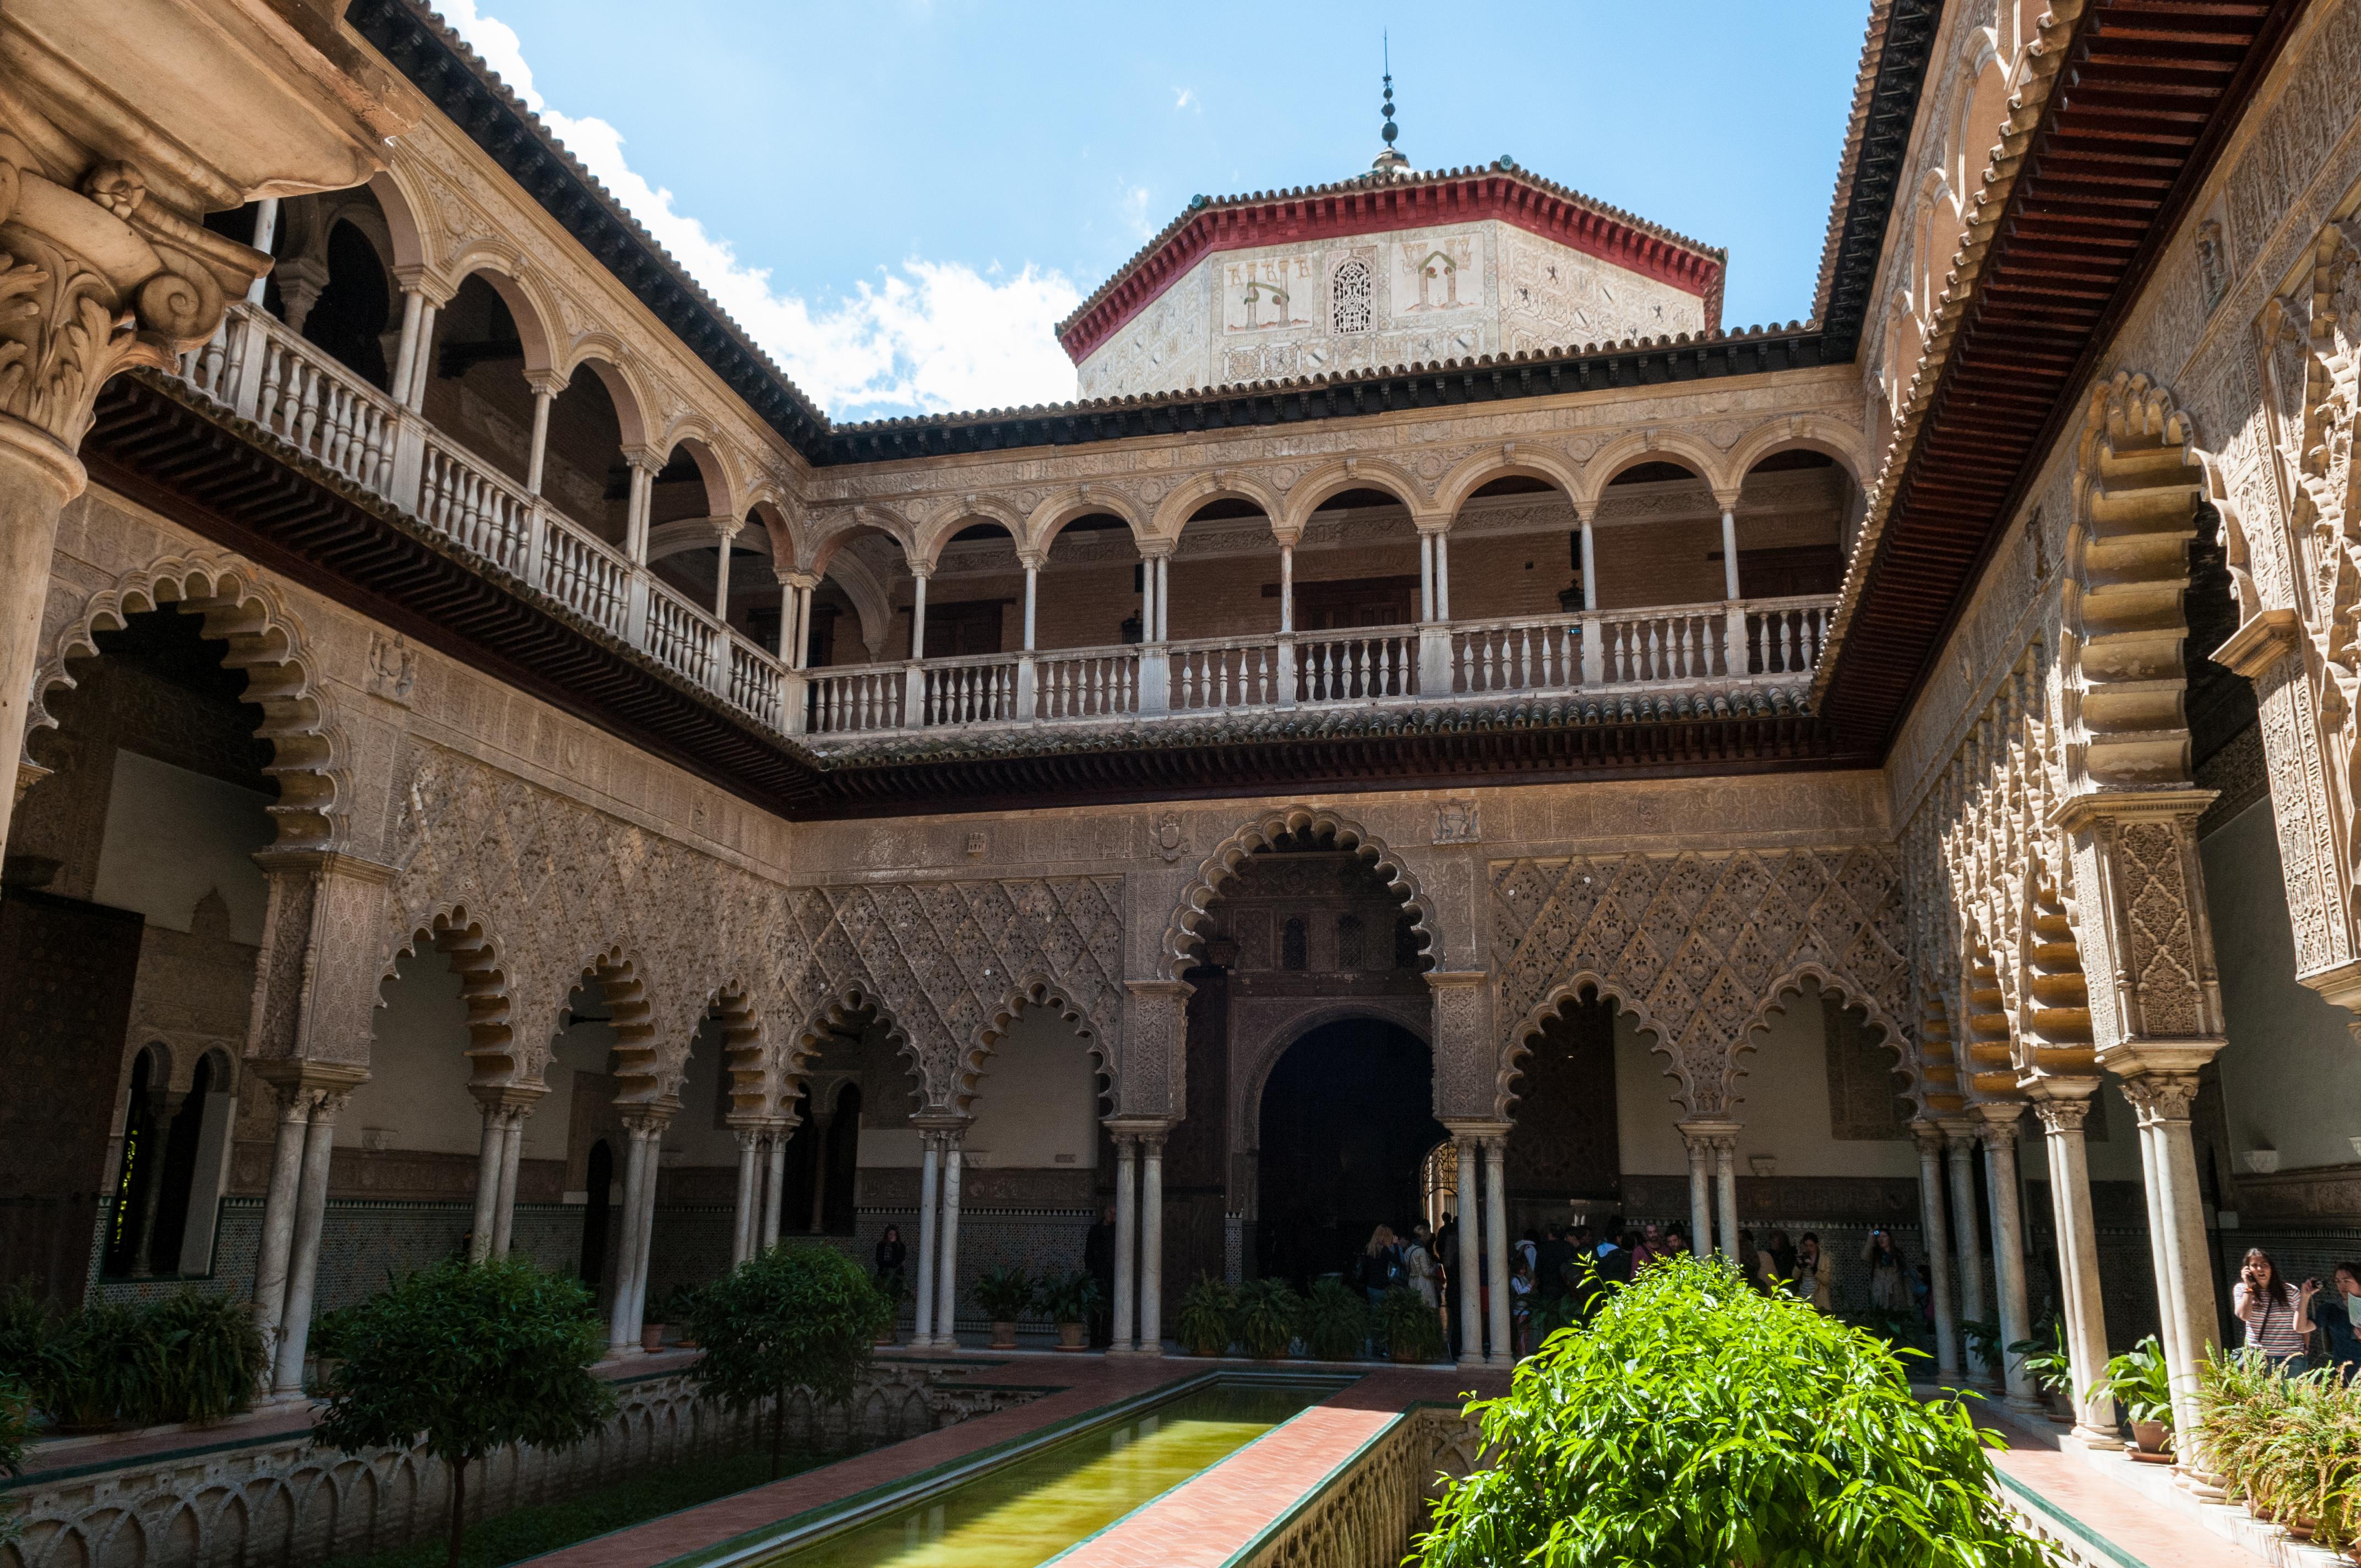 File:Alcázar of Seville (7077893783).jpg - Wikimedia Commons